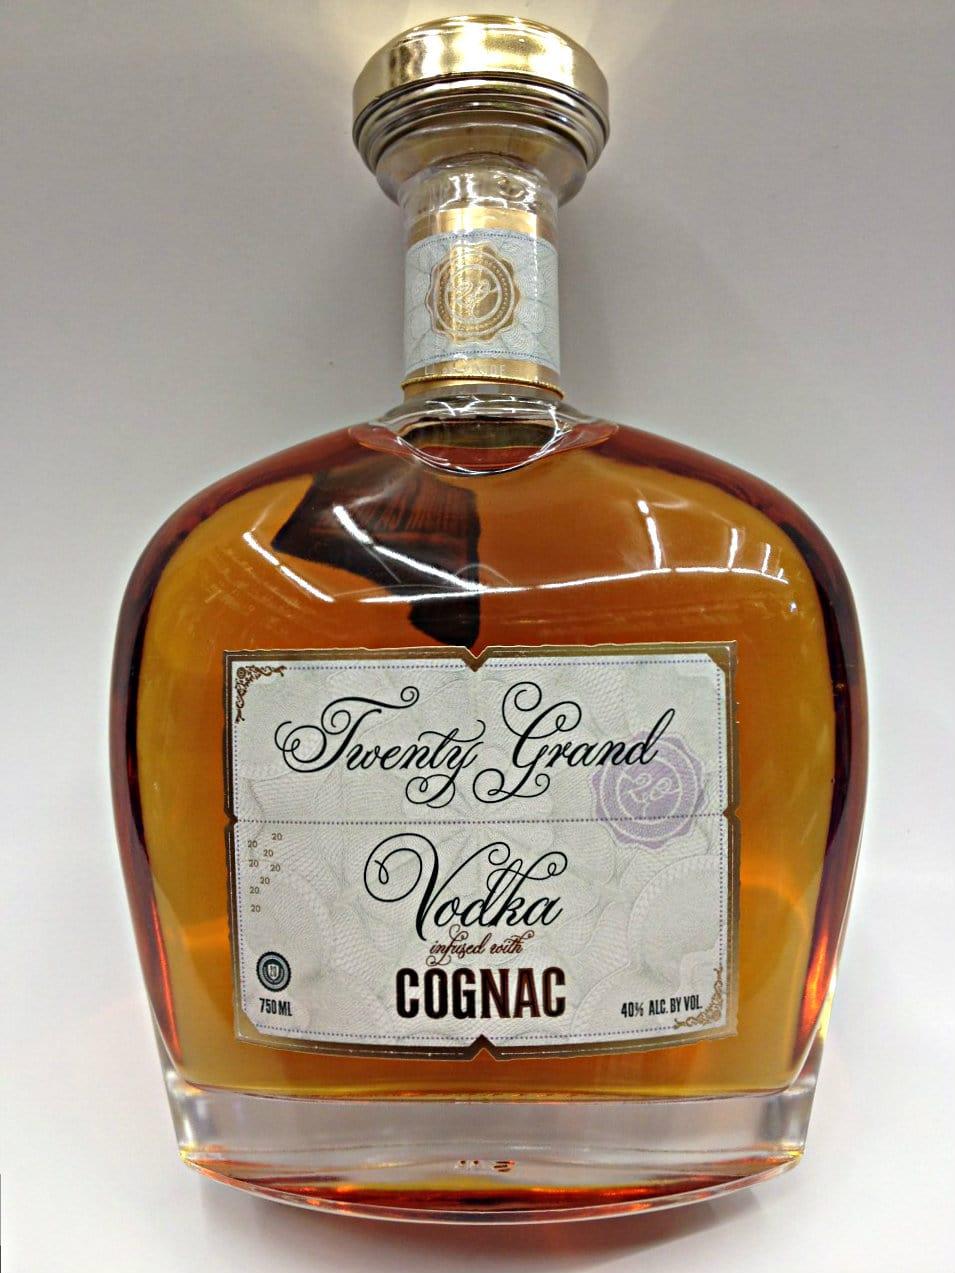 Twenty Grand Vodka Infused Cognac 80 Proof: Marketview Liquor